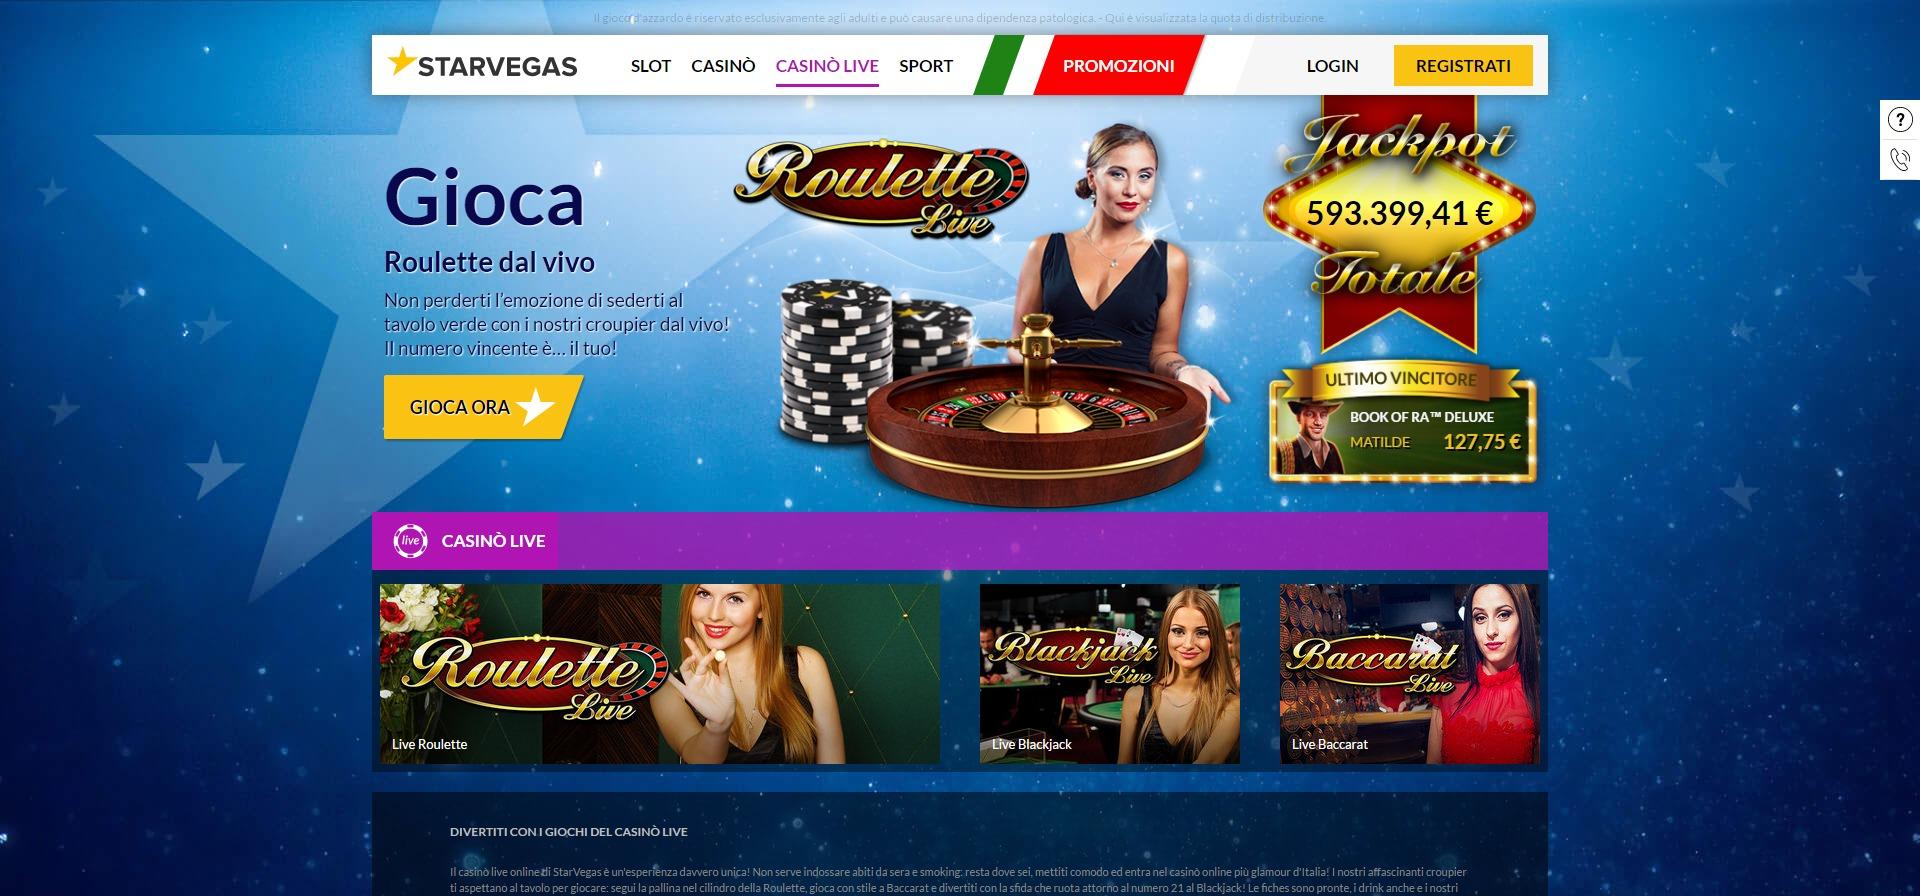 Gambling vice